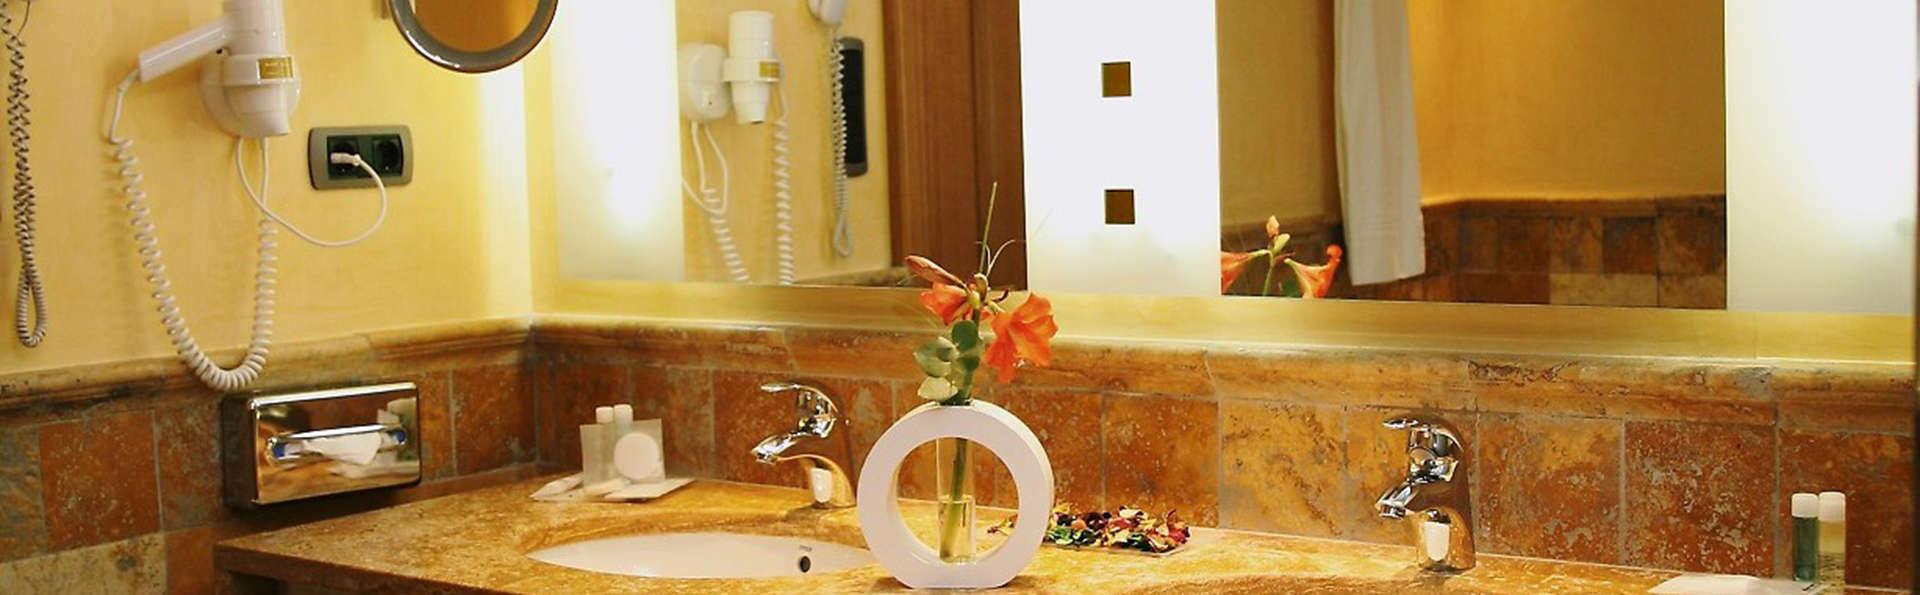 Vincci Selección Envía Almería Wellness & Golf - edit_bathroom.jpg